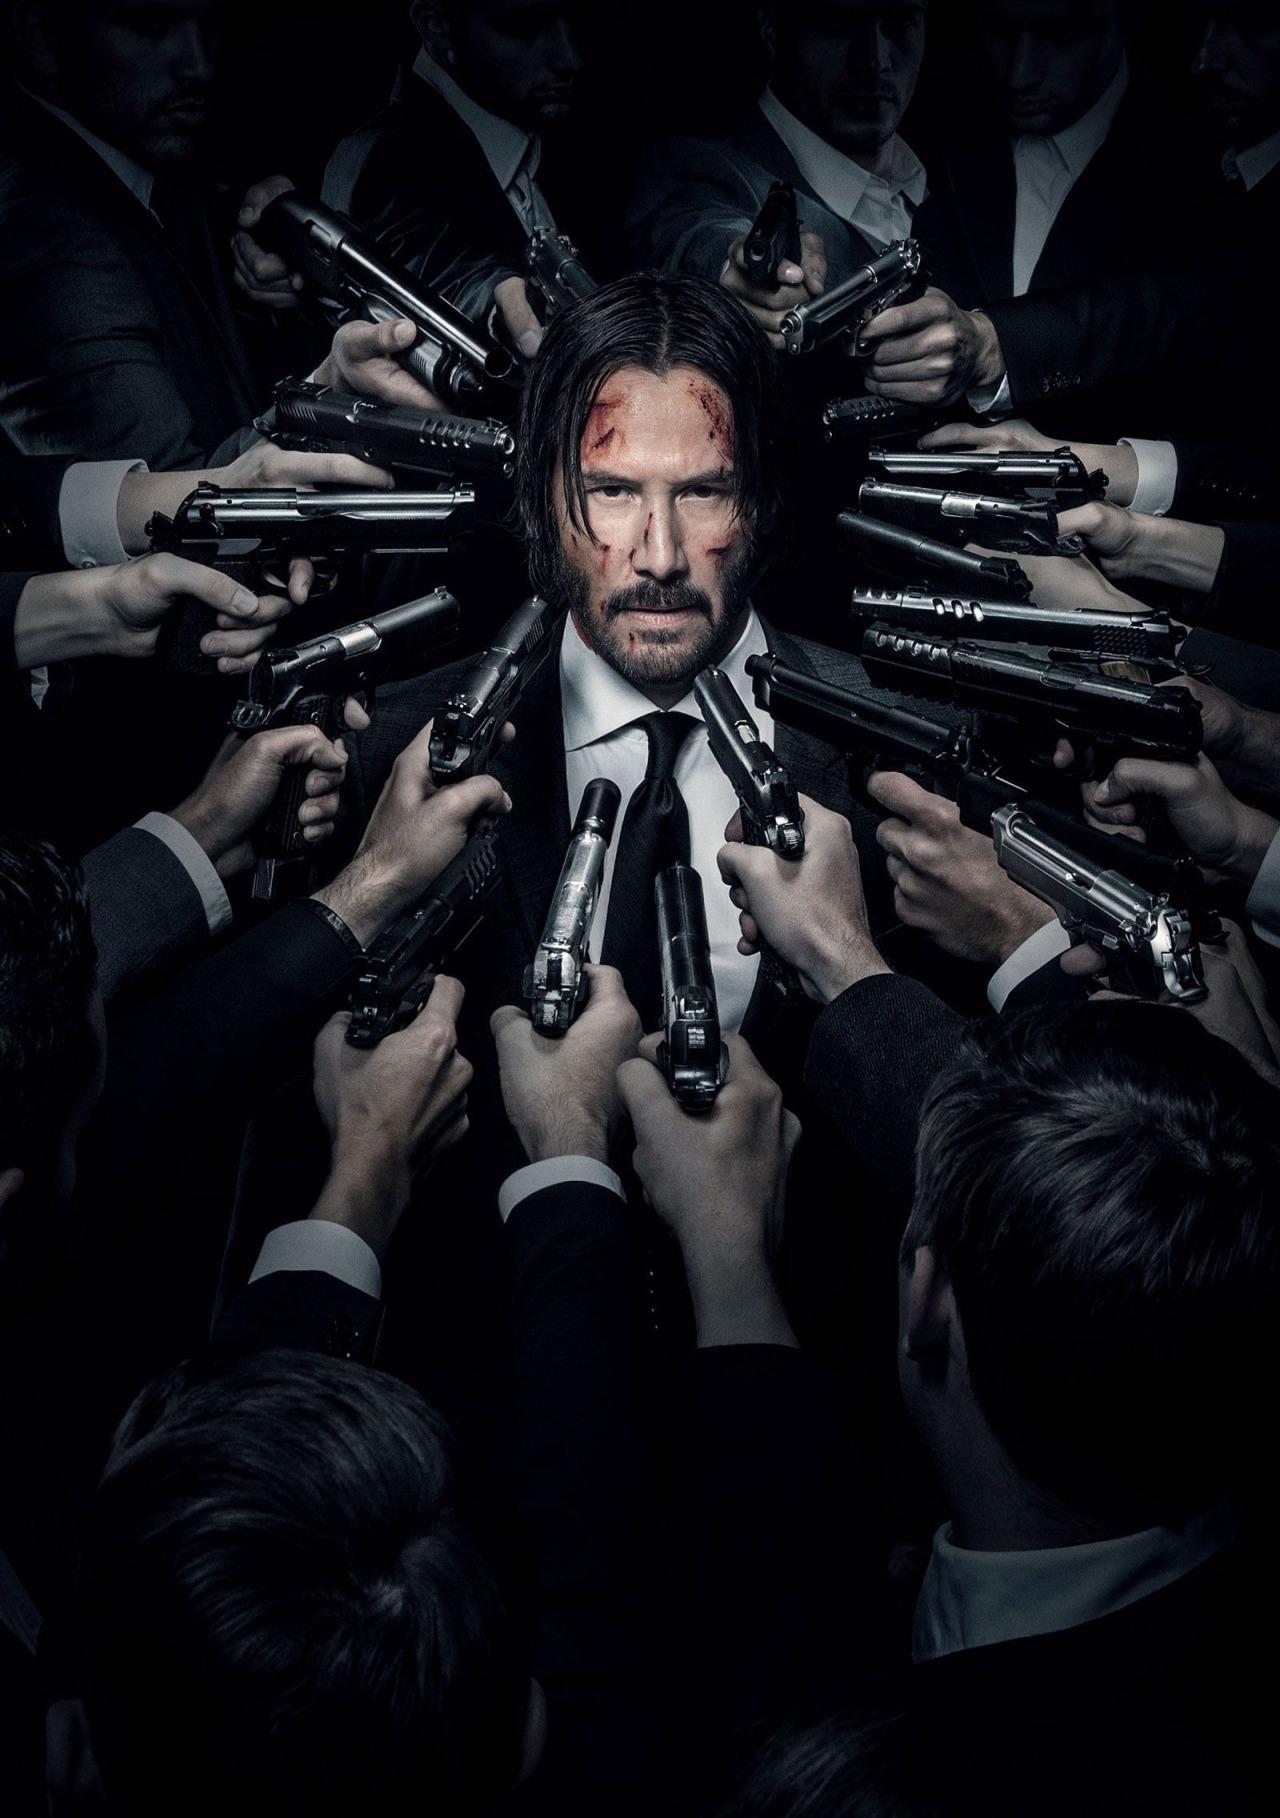 Chapter 2 #black#cinema#film#keanu reeves#john wick#chapter 2 #john wick chapter 2  #john wick 2 #poster#art#chad stahelski